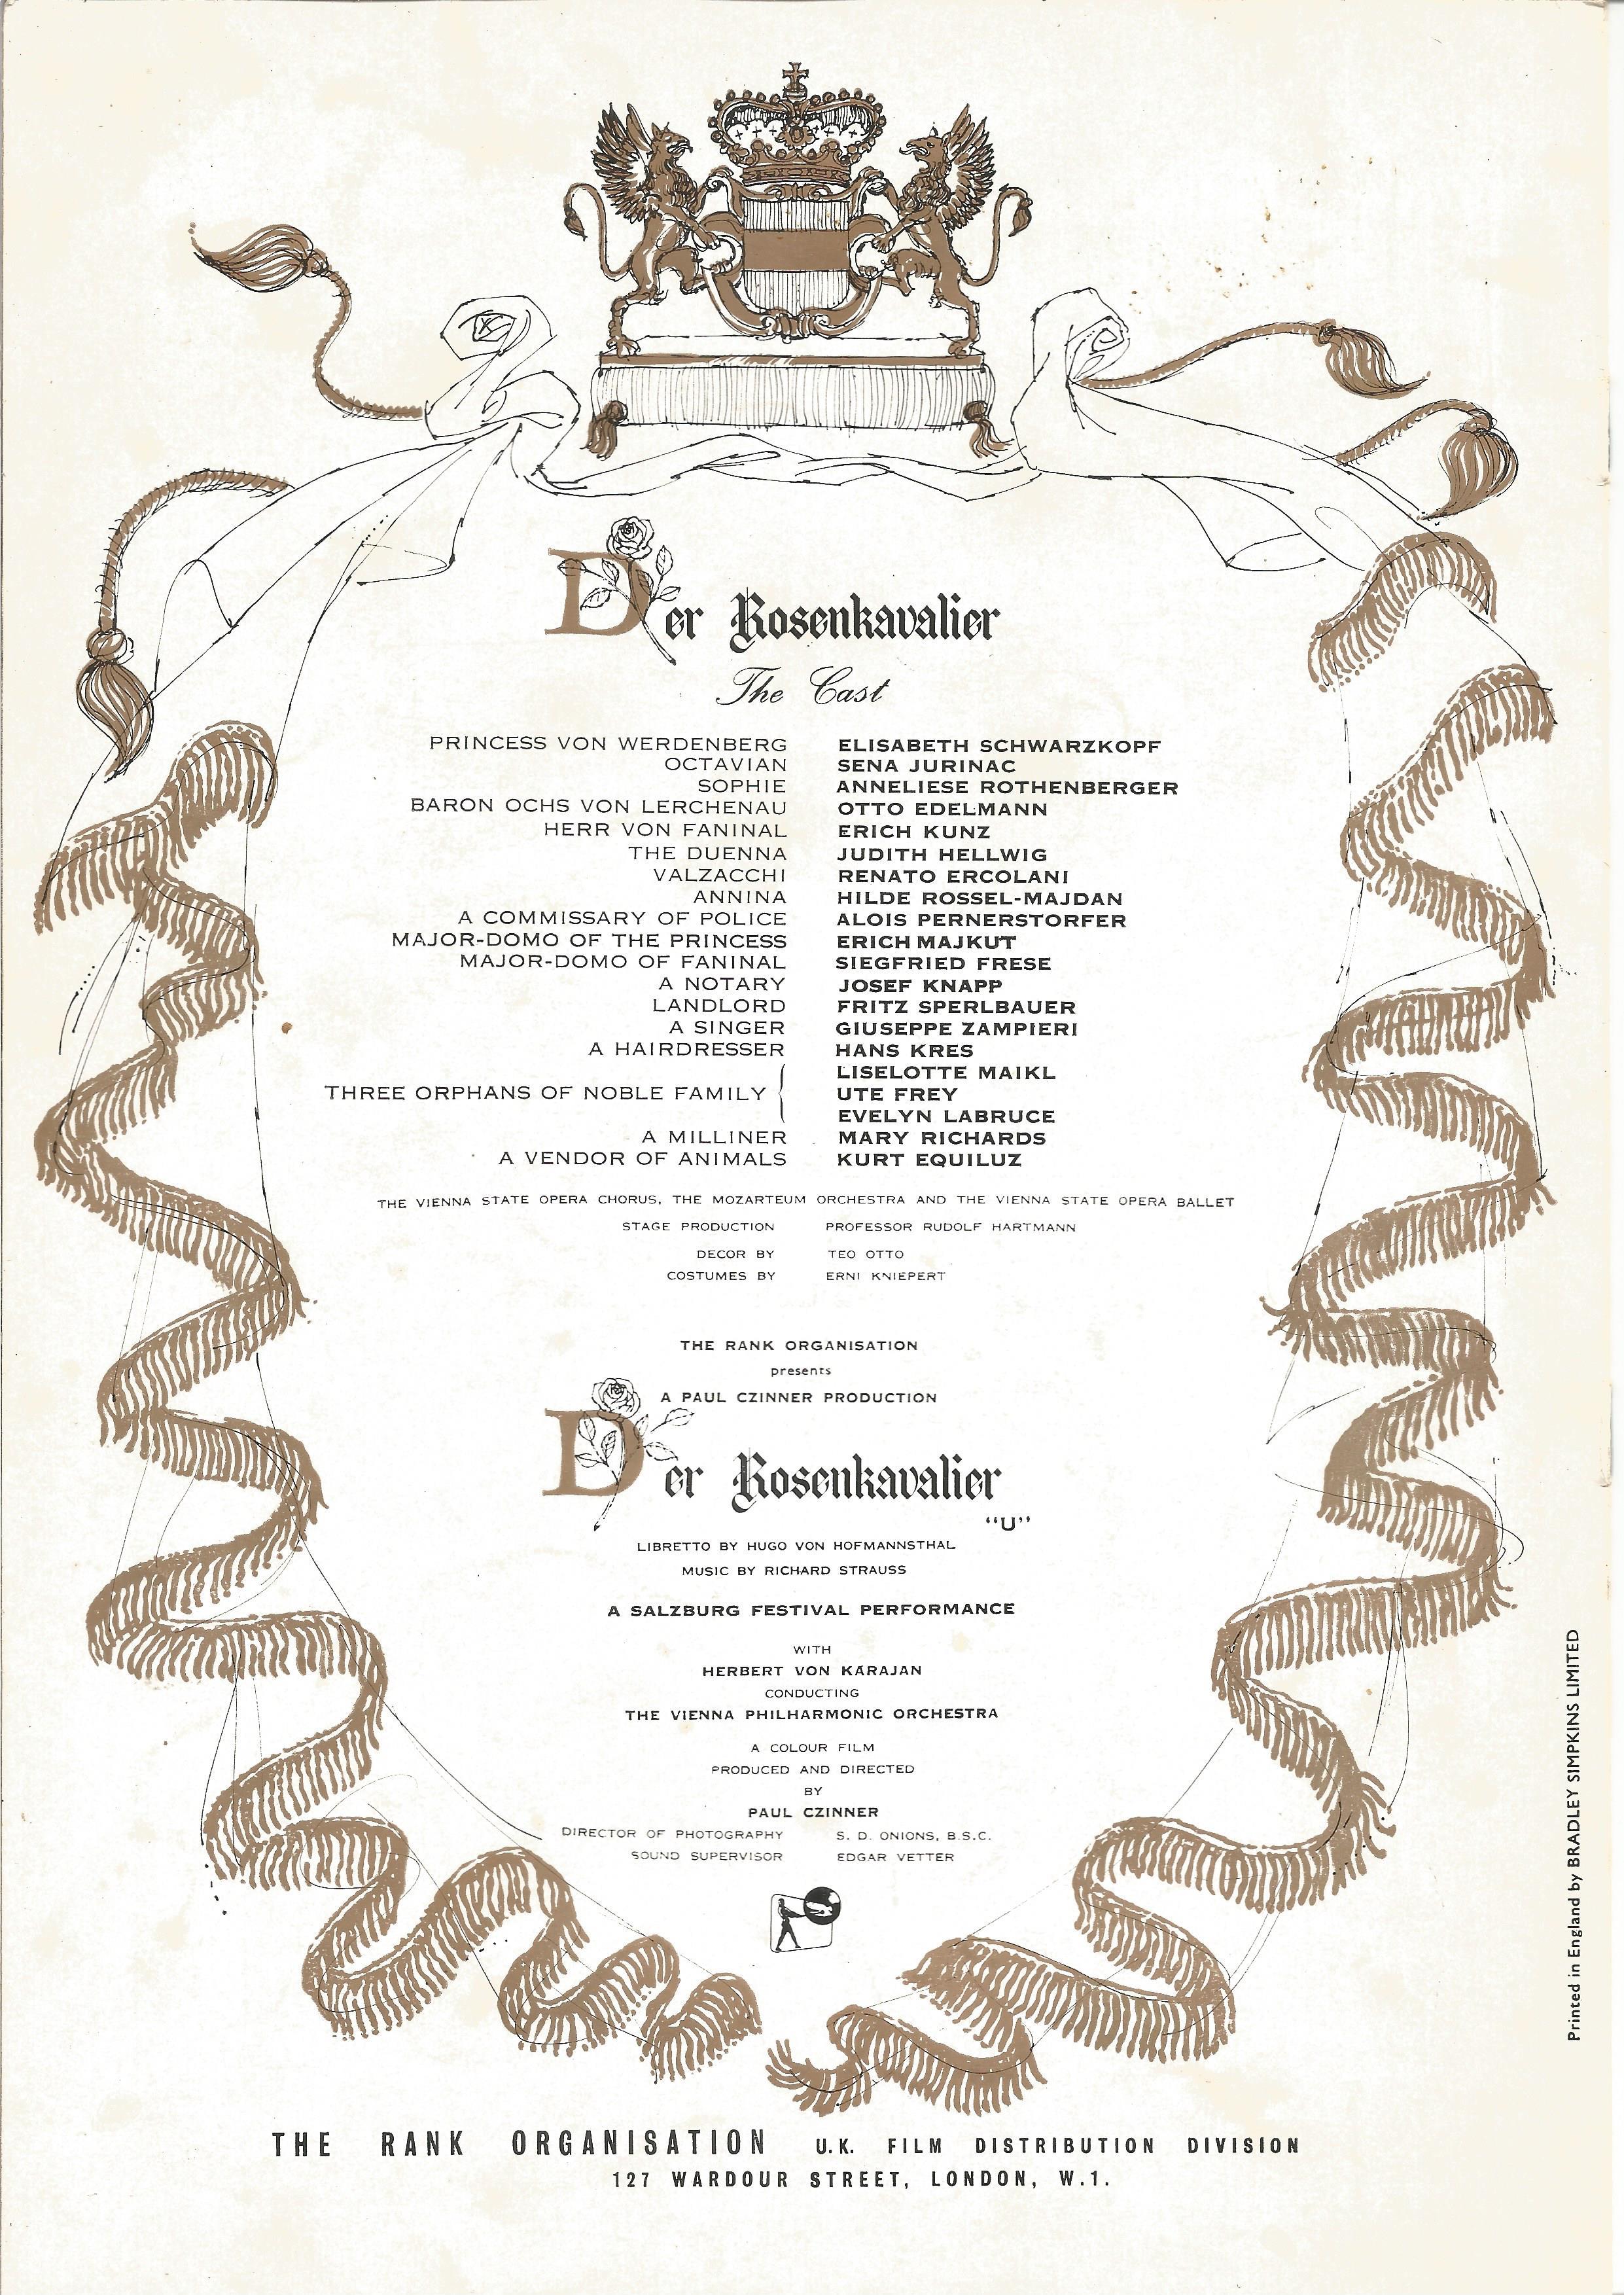 Opera in House Brochure A Dance Spectacular In Tribute to Dame Alicia Markova DBE 1990 Sadler's - Image 3 of 4